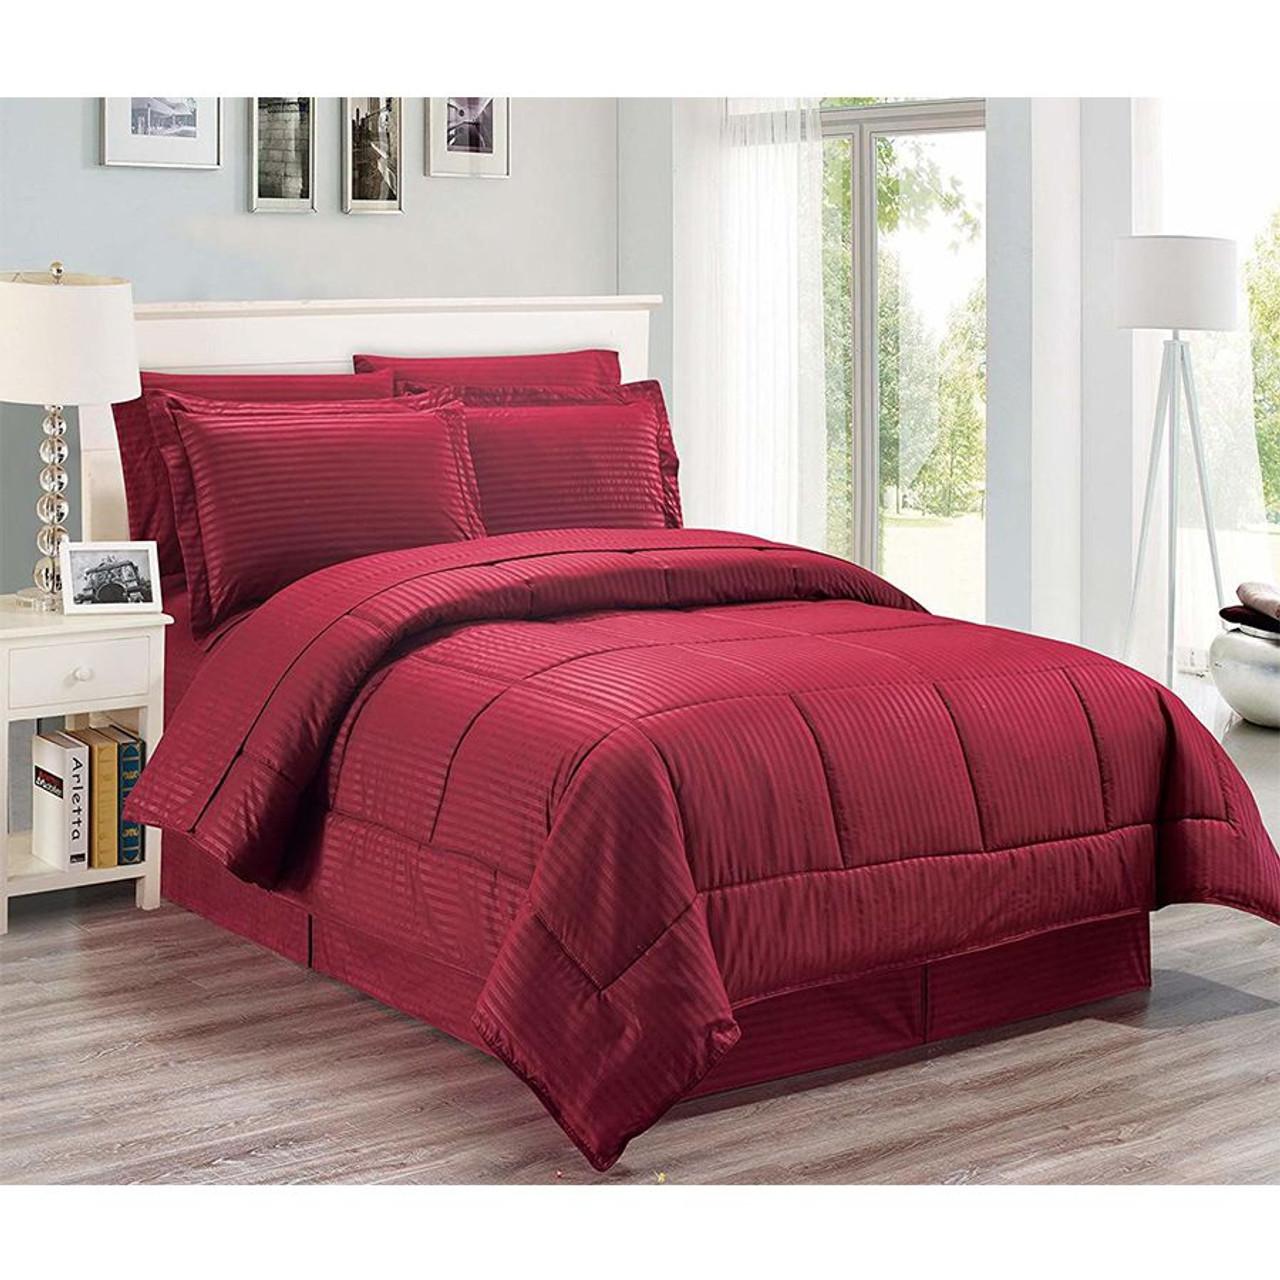 8 pc Microfiber Comforter Set Burgundy Color